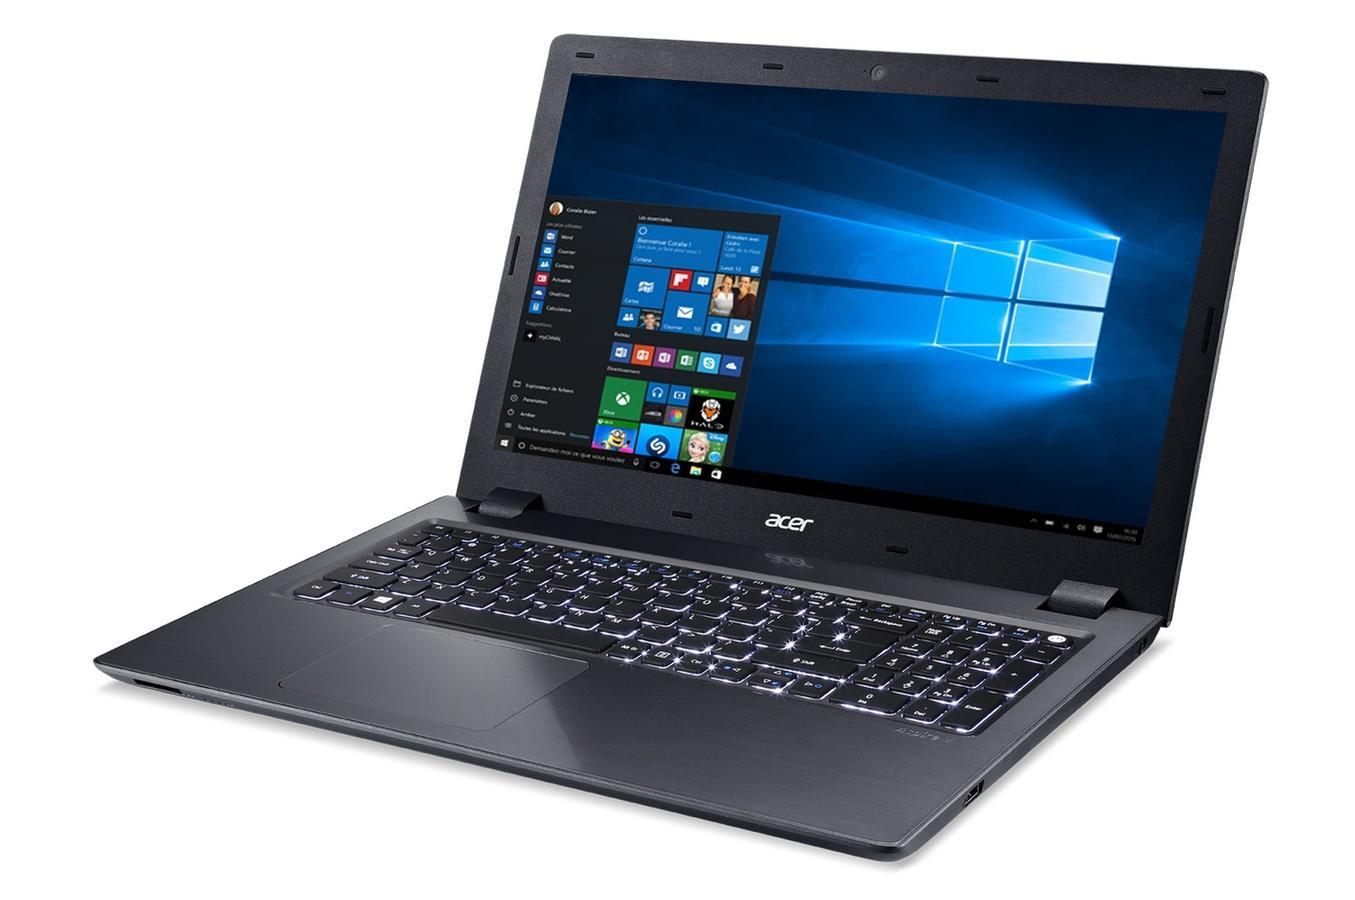 "PC Portable 15.6"" Acer Aspire V5-591G-56GL - HD,  i5-6300HQ 2,3 GHz, RAM 4 Go, HDD 1 To"